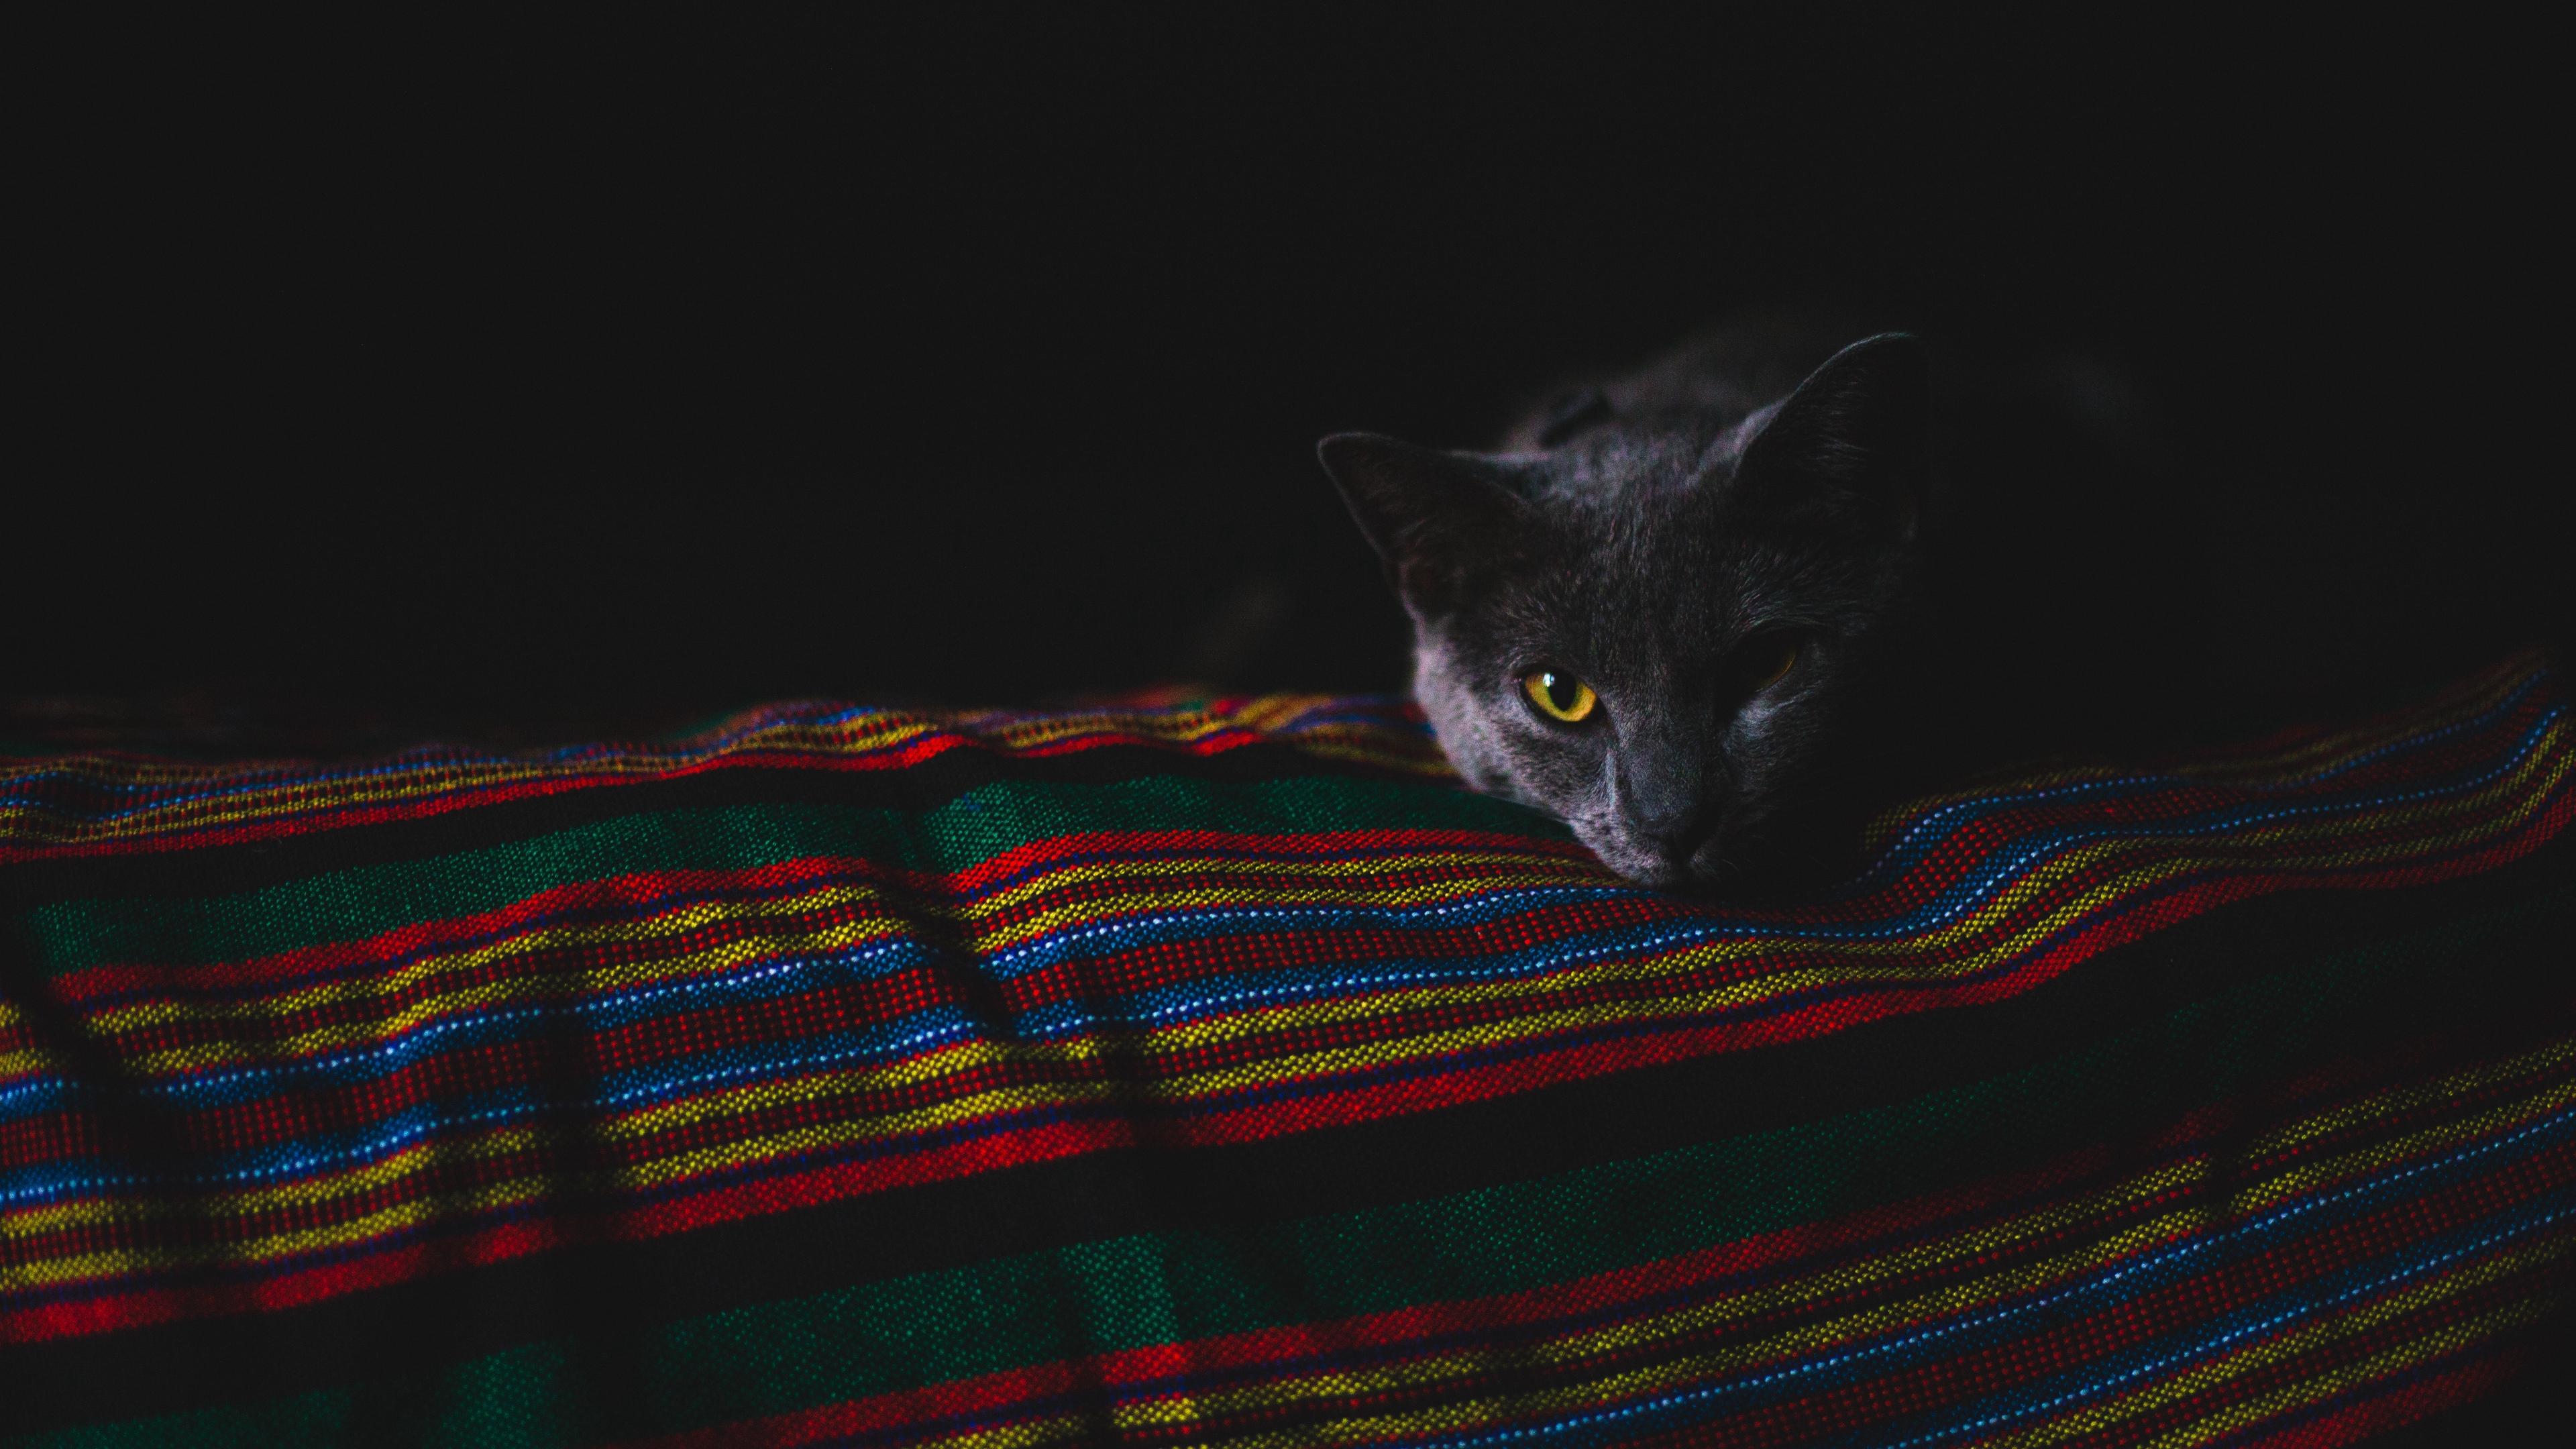 cat gray muzzle dark 4k 1540574484 - cat, gray, muzzle, dark 4k - muzzle, Gray, Cat